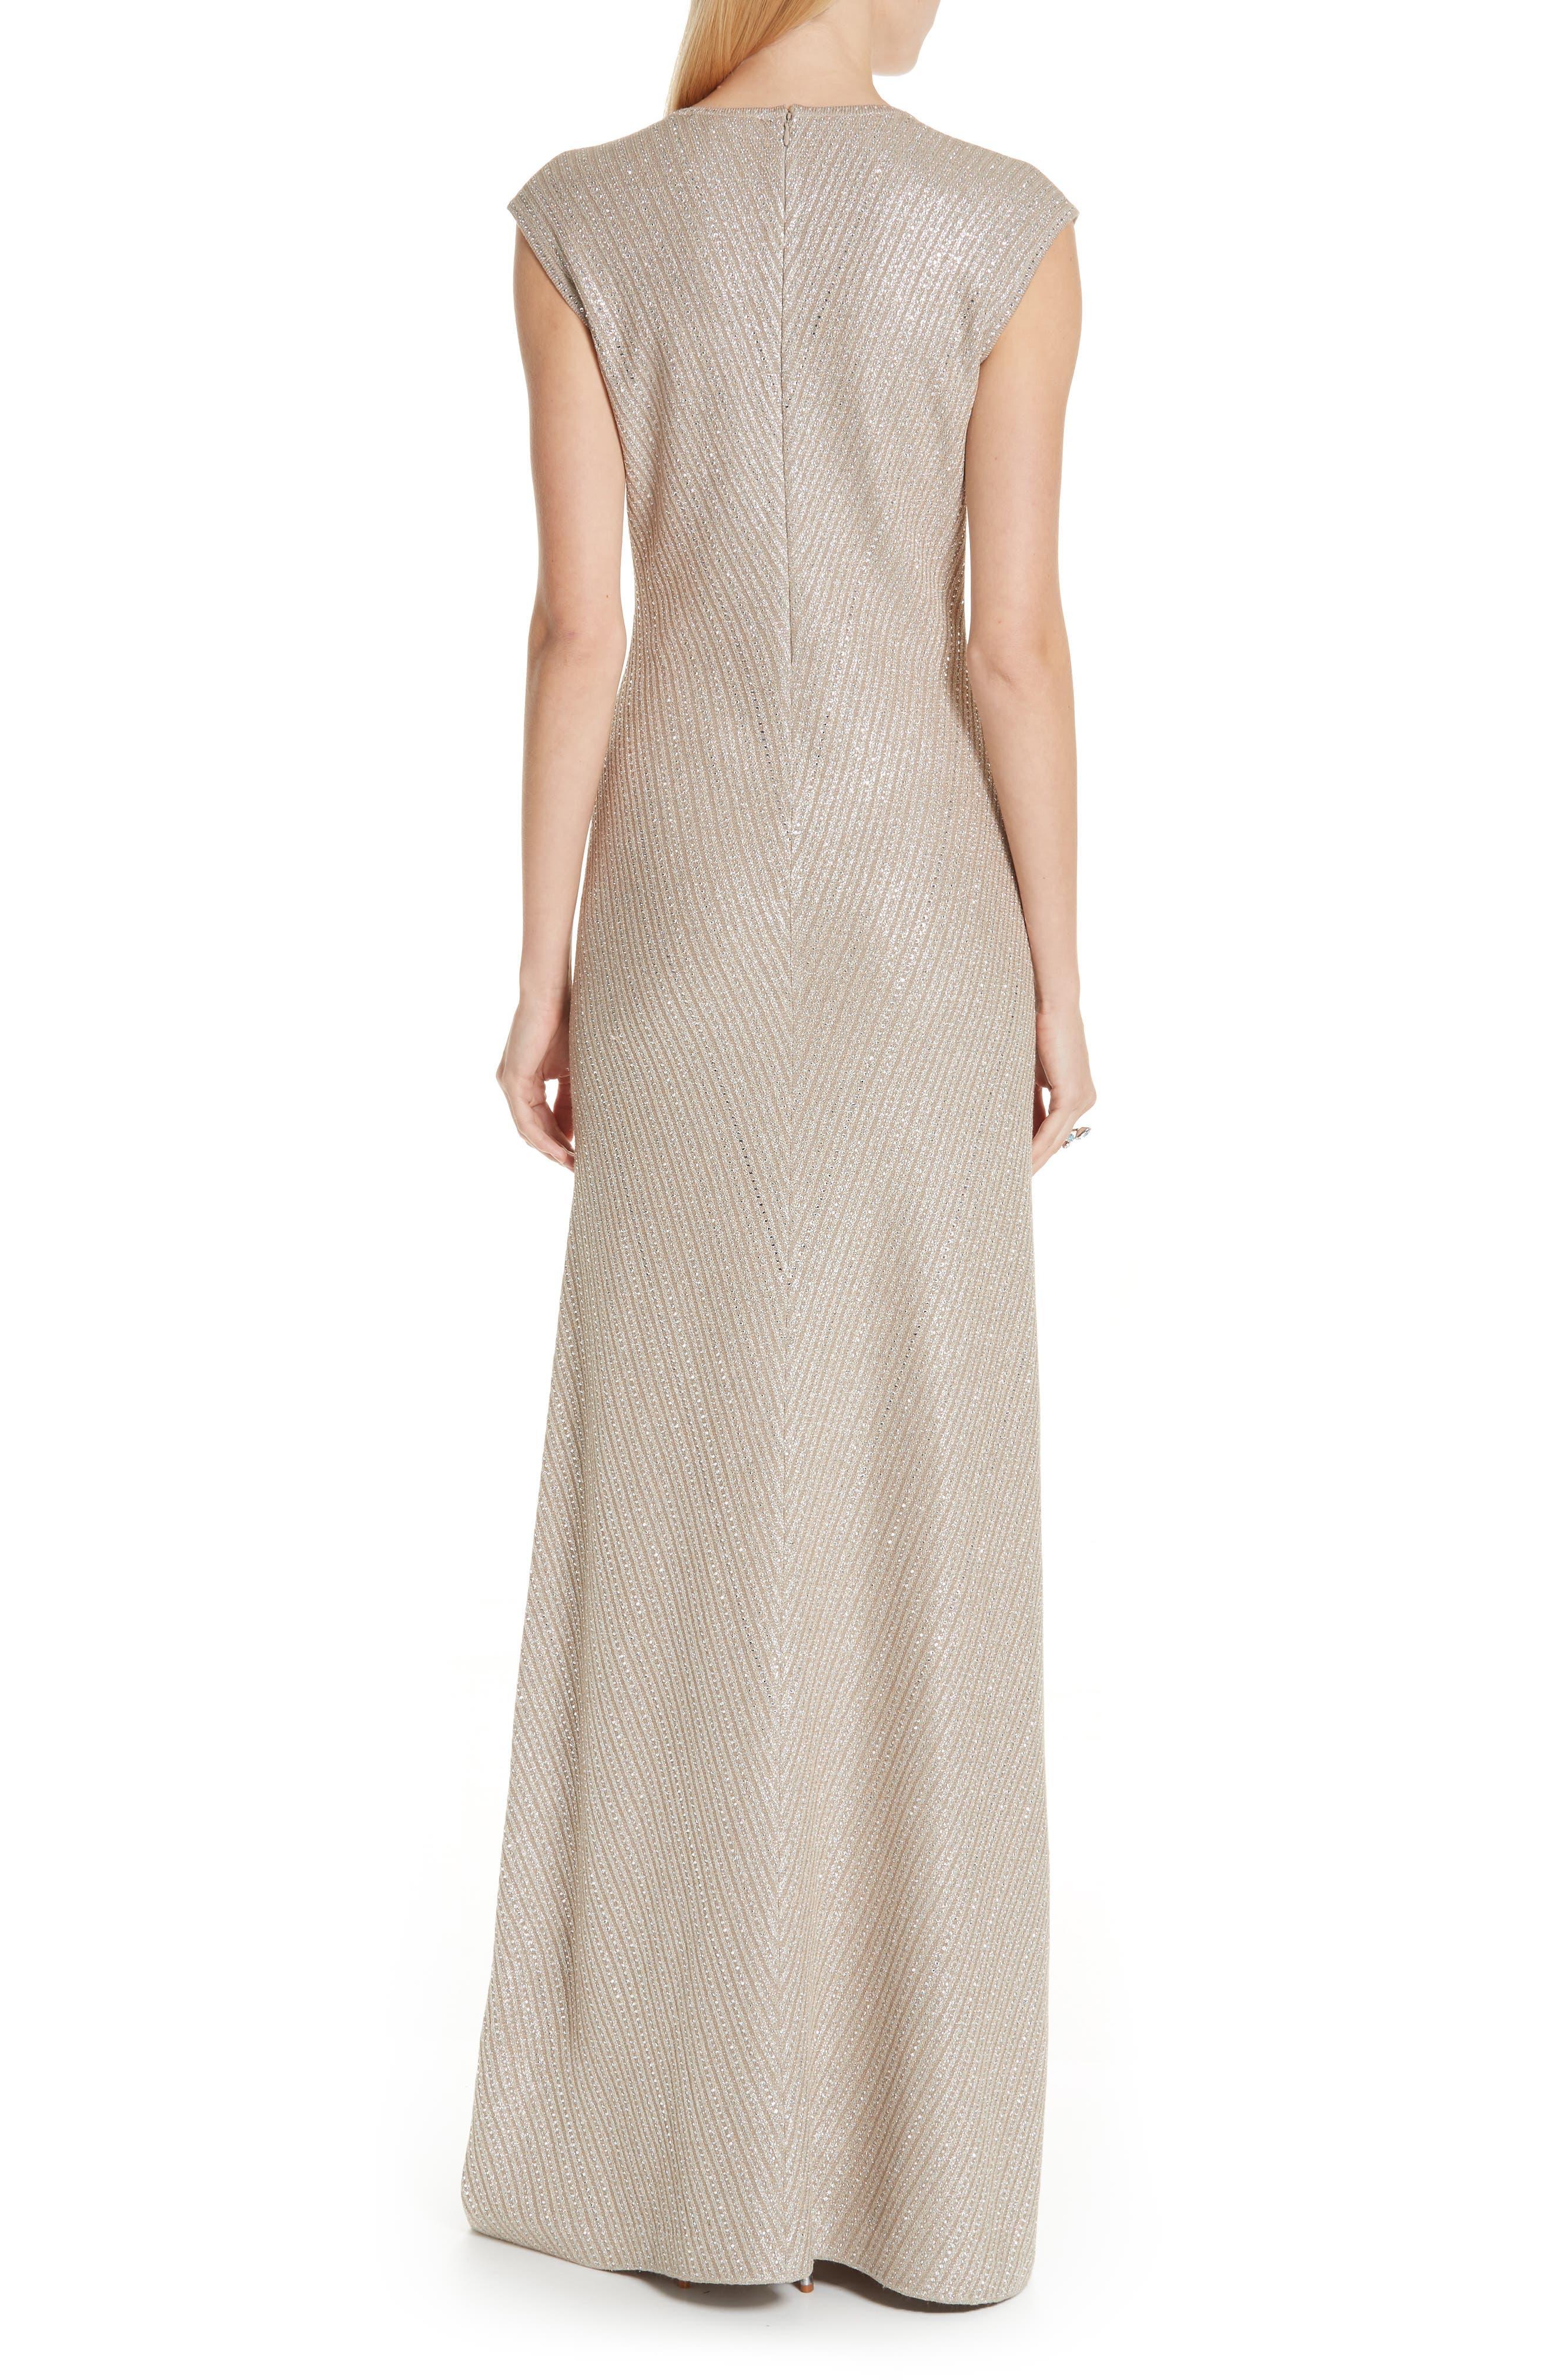 ST. JOHN COLLECTION, Brielle Knit V-Neck Gown, Alternate thumbnail 2, color, DARK KHAKI/ GOLD